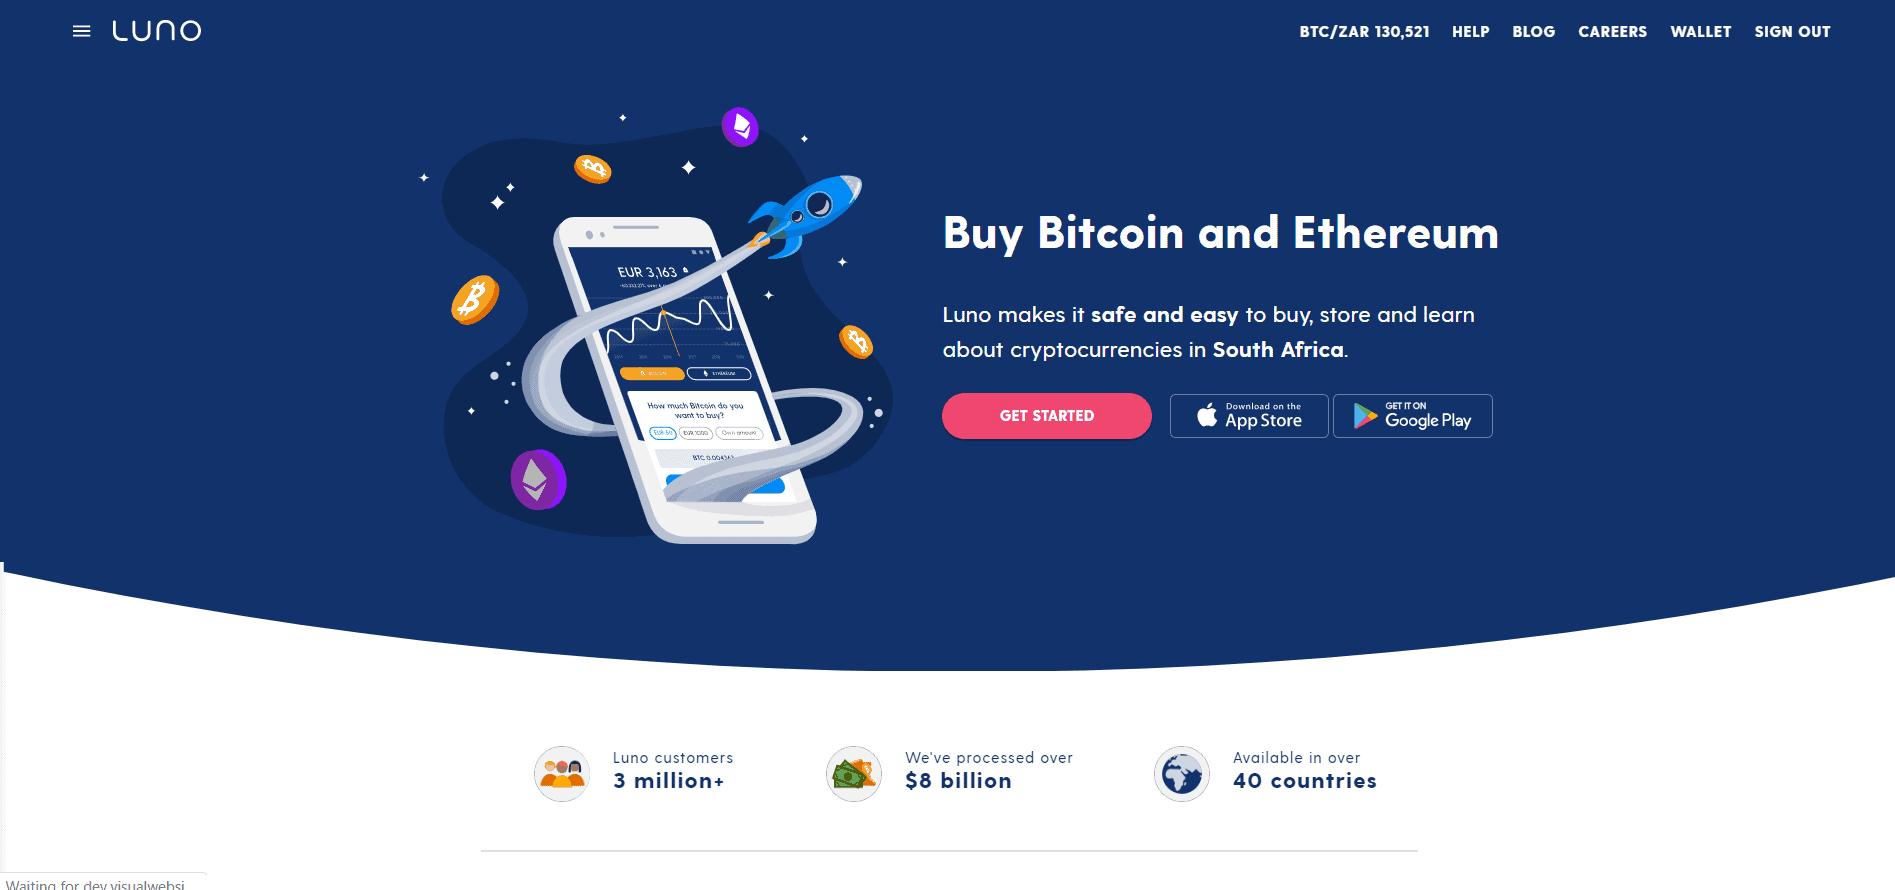 Bitcoin login sign up